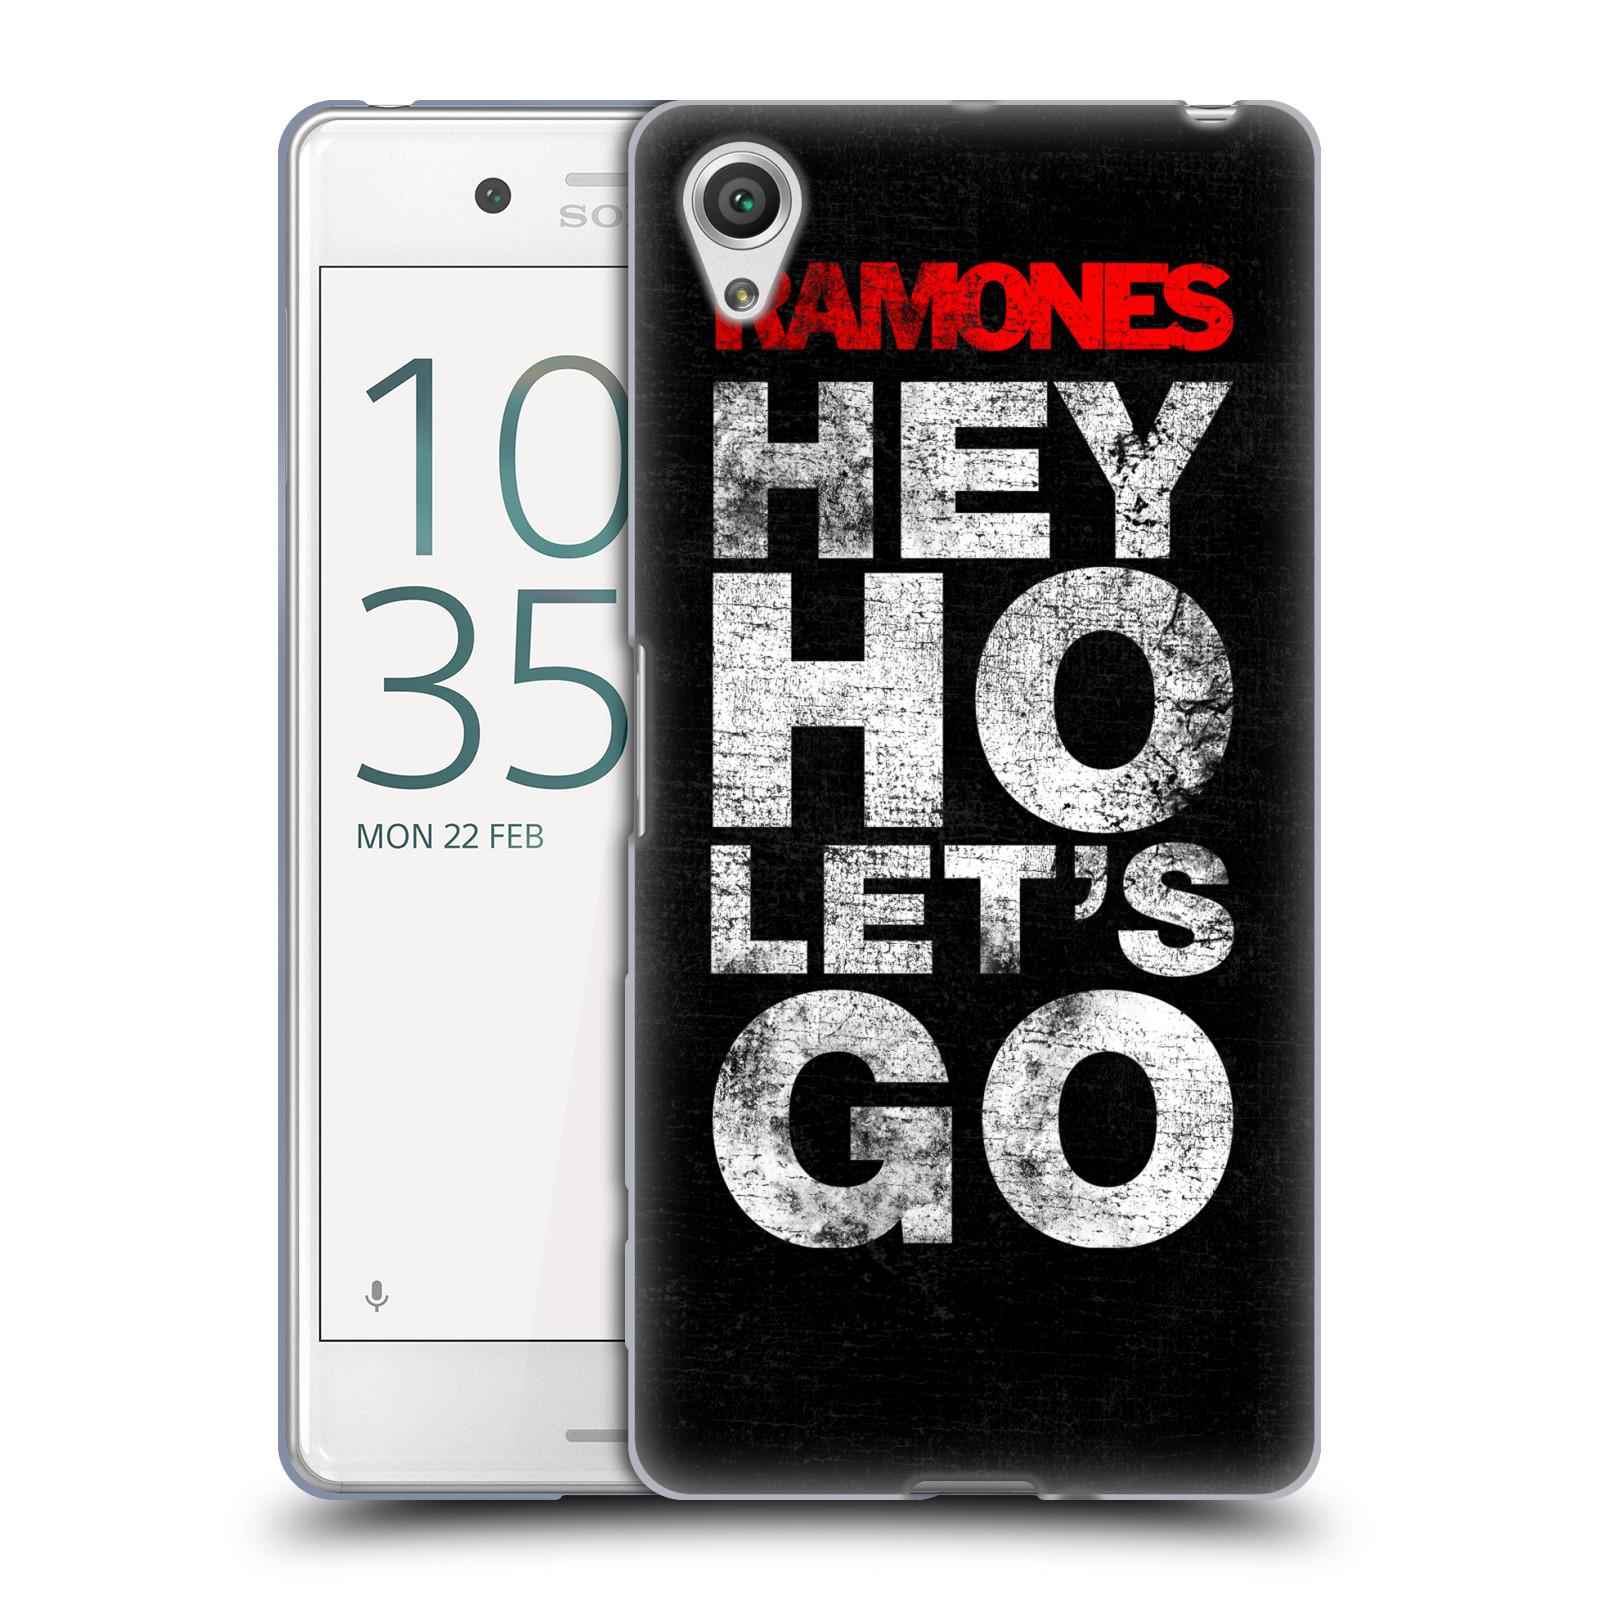 Silikonové pouzdro na mobil Sony Xperia X Performance HEAD CASE The Ramones - HEY HO LET´S GO (Silikonový kryt či obal na mobilní telefon s oficiálním licencovaným motivem The Ramones pro Sony Xperia X Performance F8132)